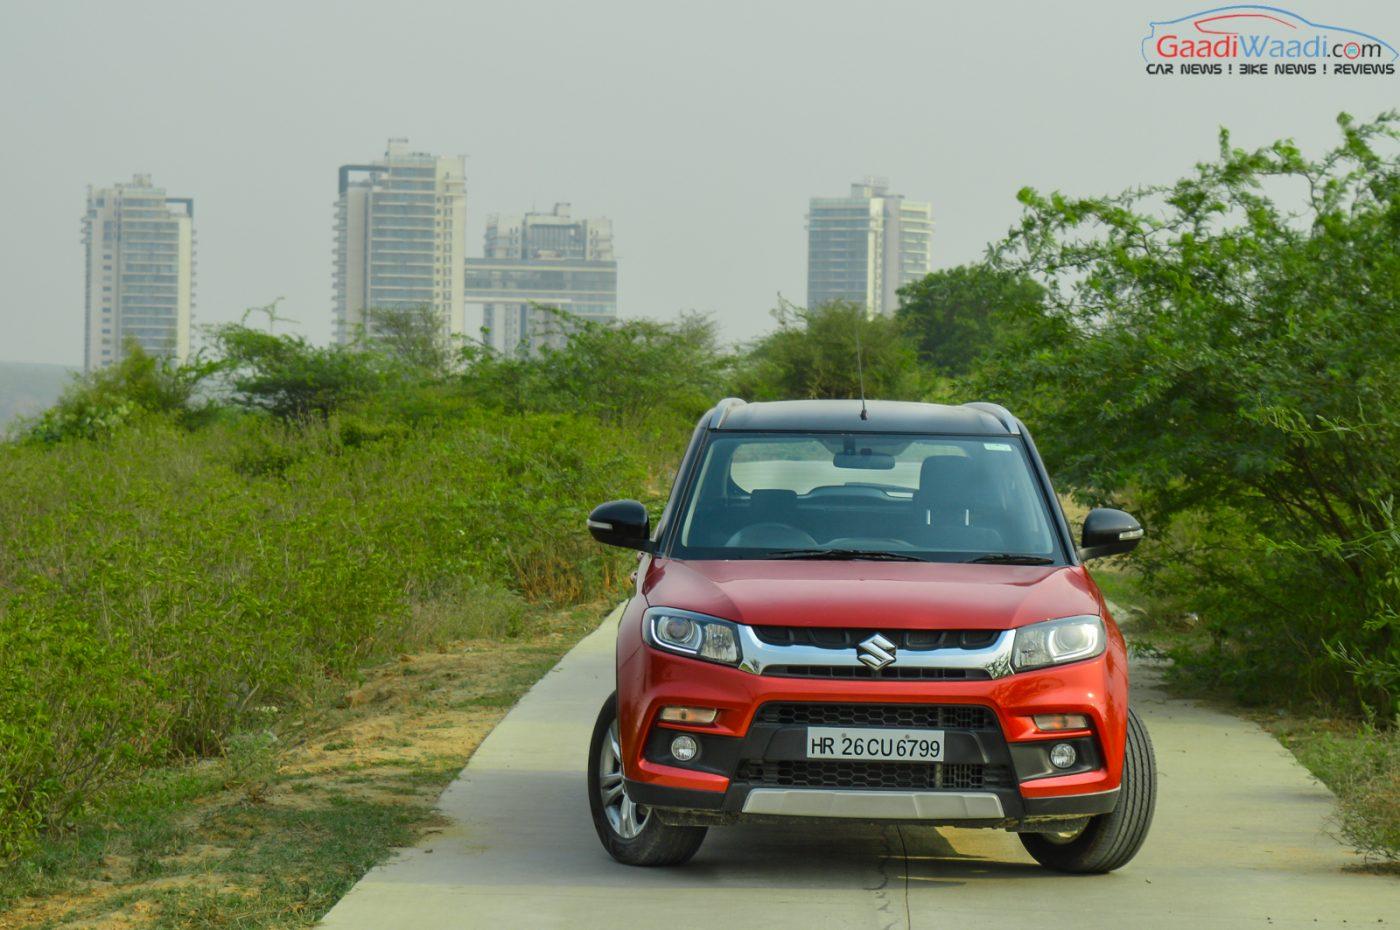 maruti suzuki increases price  entire range gaadiwaadicom car news bike news reviews